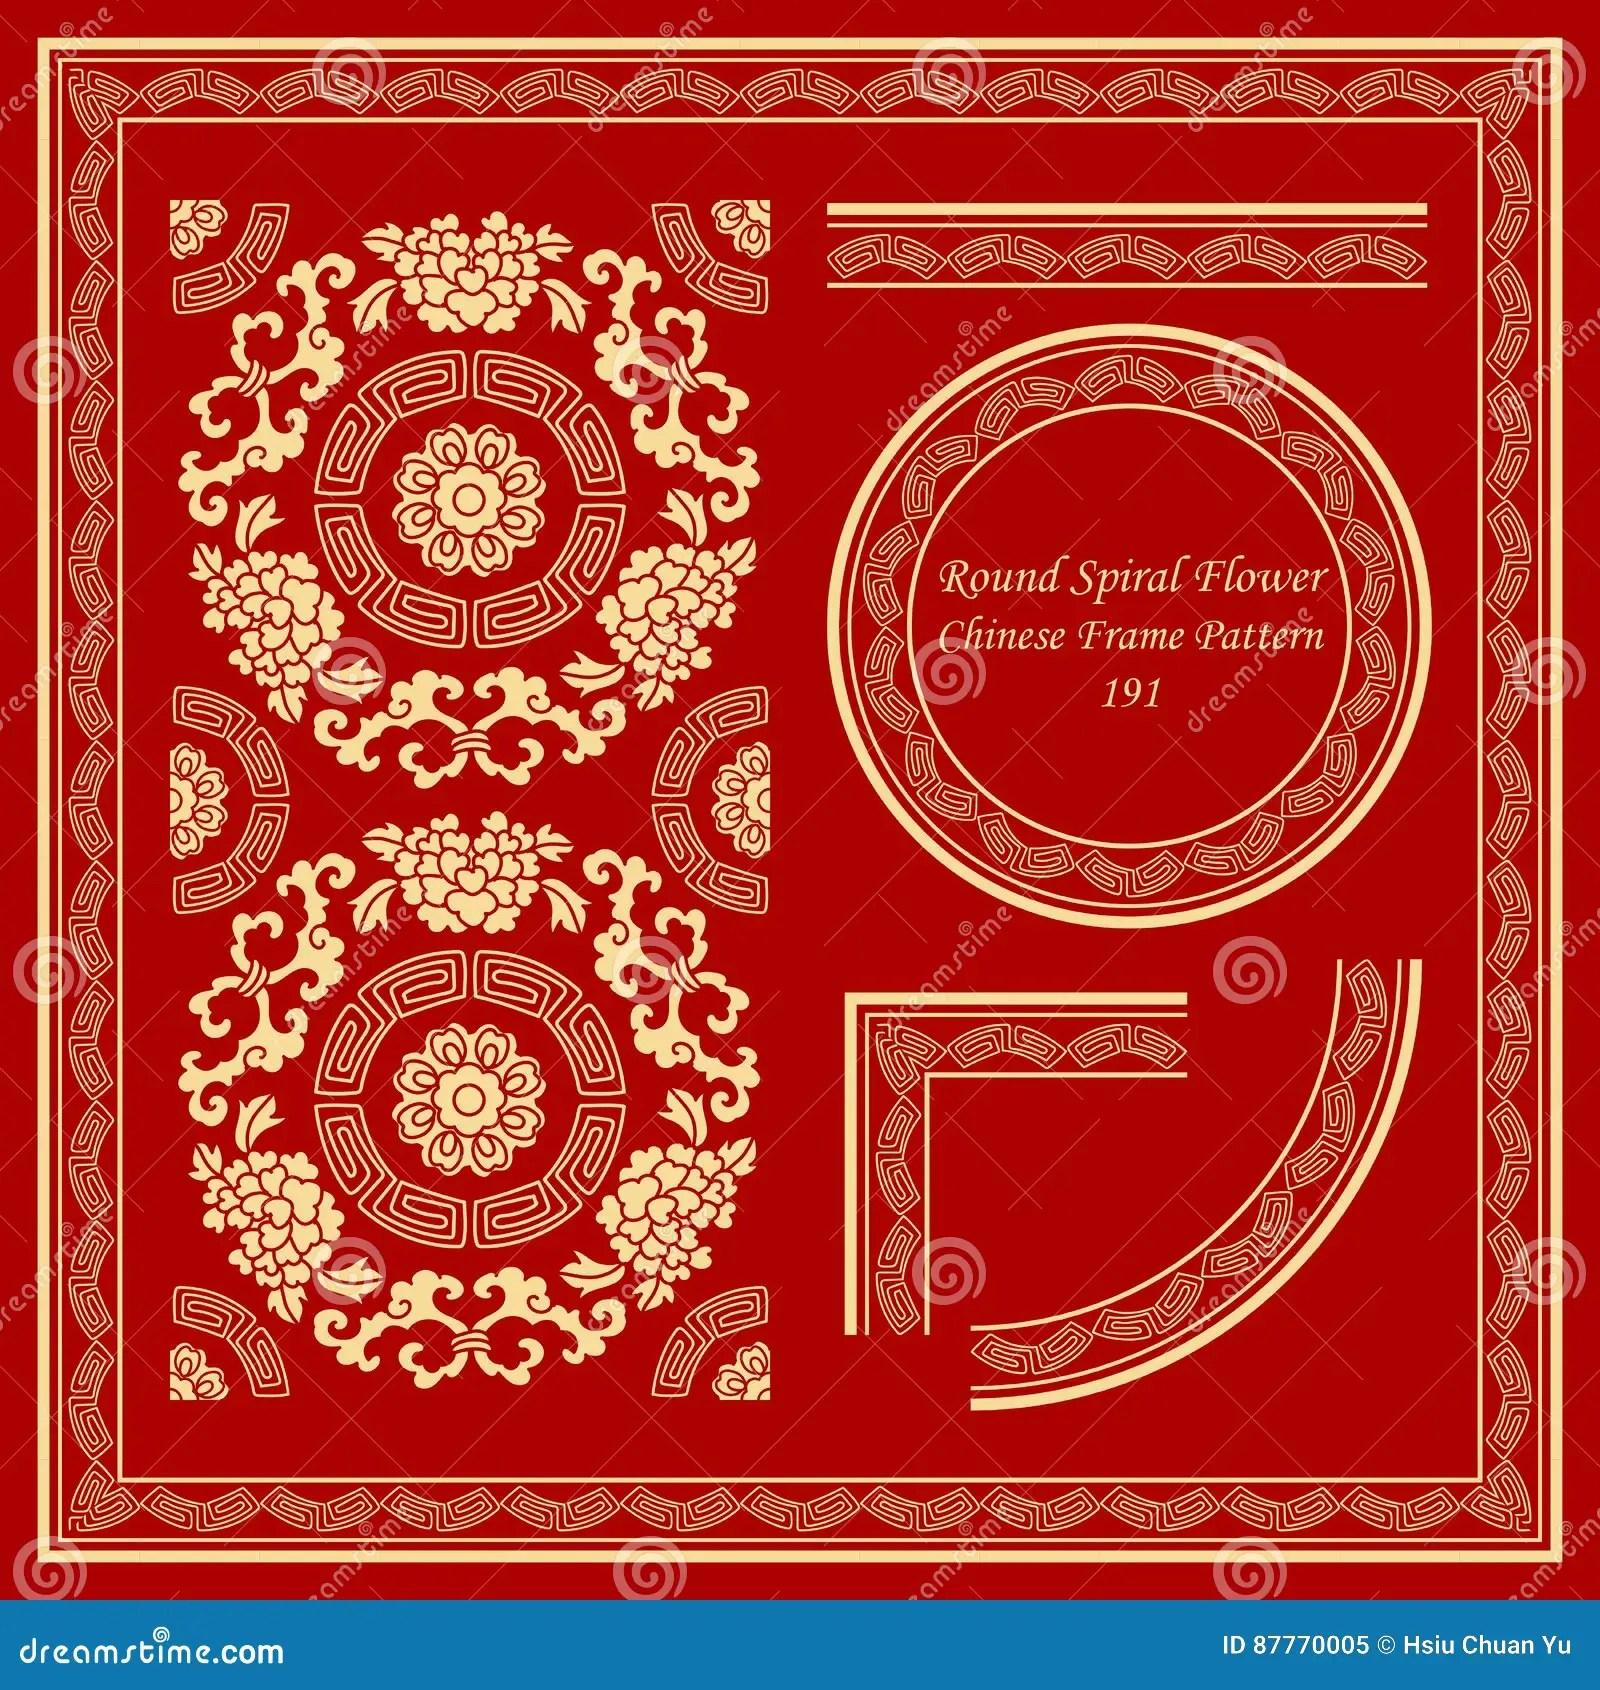 framed prints for kitchens white kitchen island with granite top 葡萄酒中国框架样式集合圆的螺旋框架花藤向量例证 插画包括有国界的 葡萄酒中国框架样式集合圆的螺旋框架花藤可以为印刷品和网页使用